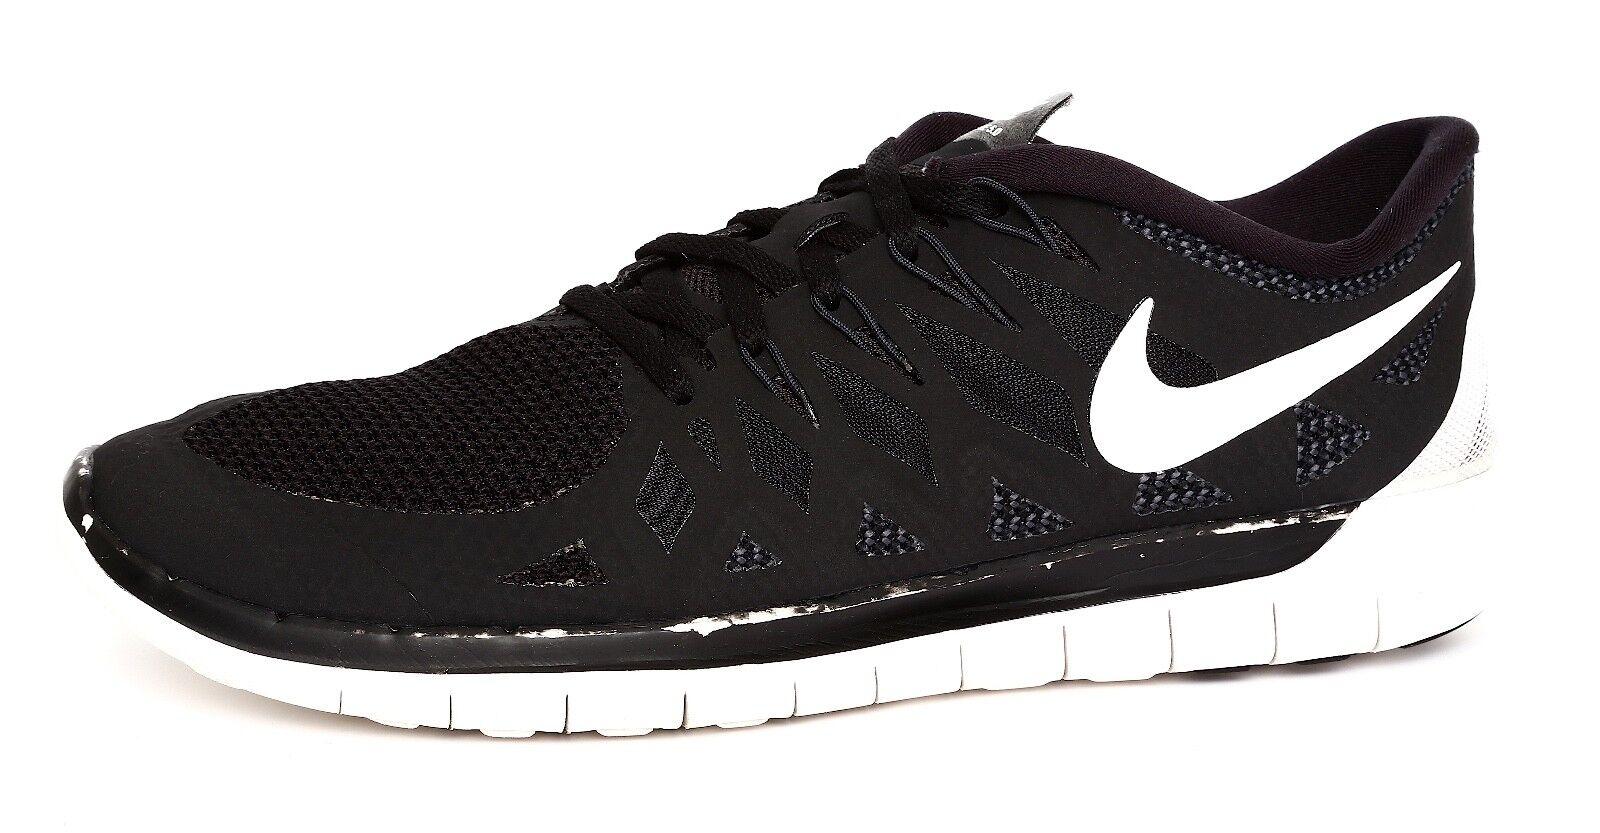 Nike Free 5.0 Men's Black Lace Up Sneaker Sz 11 4293